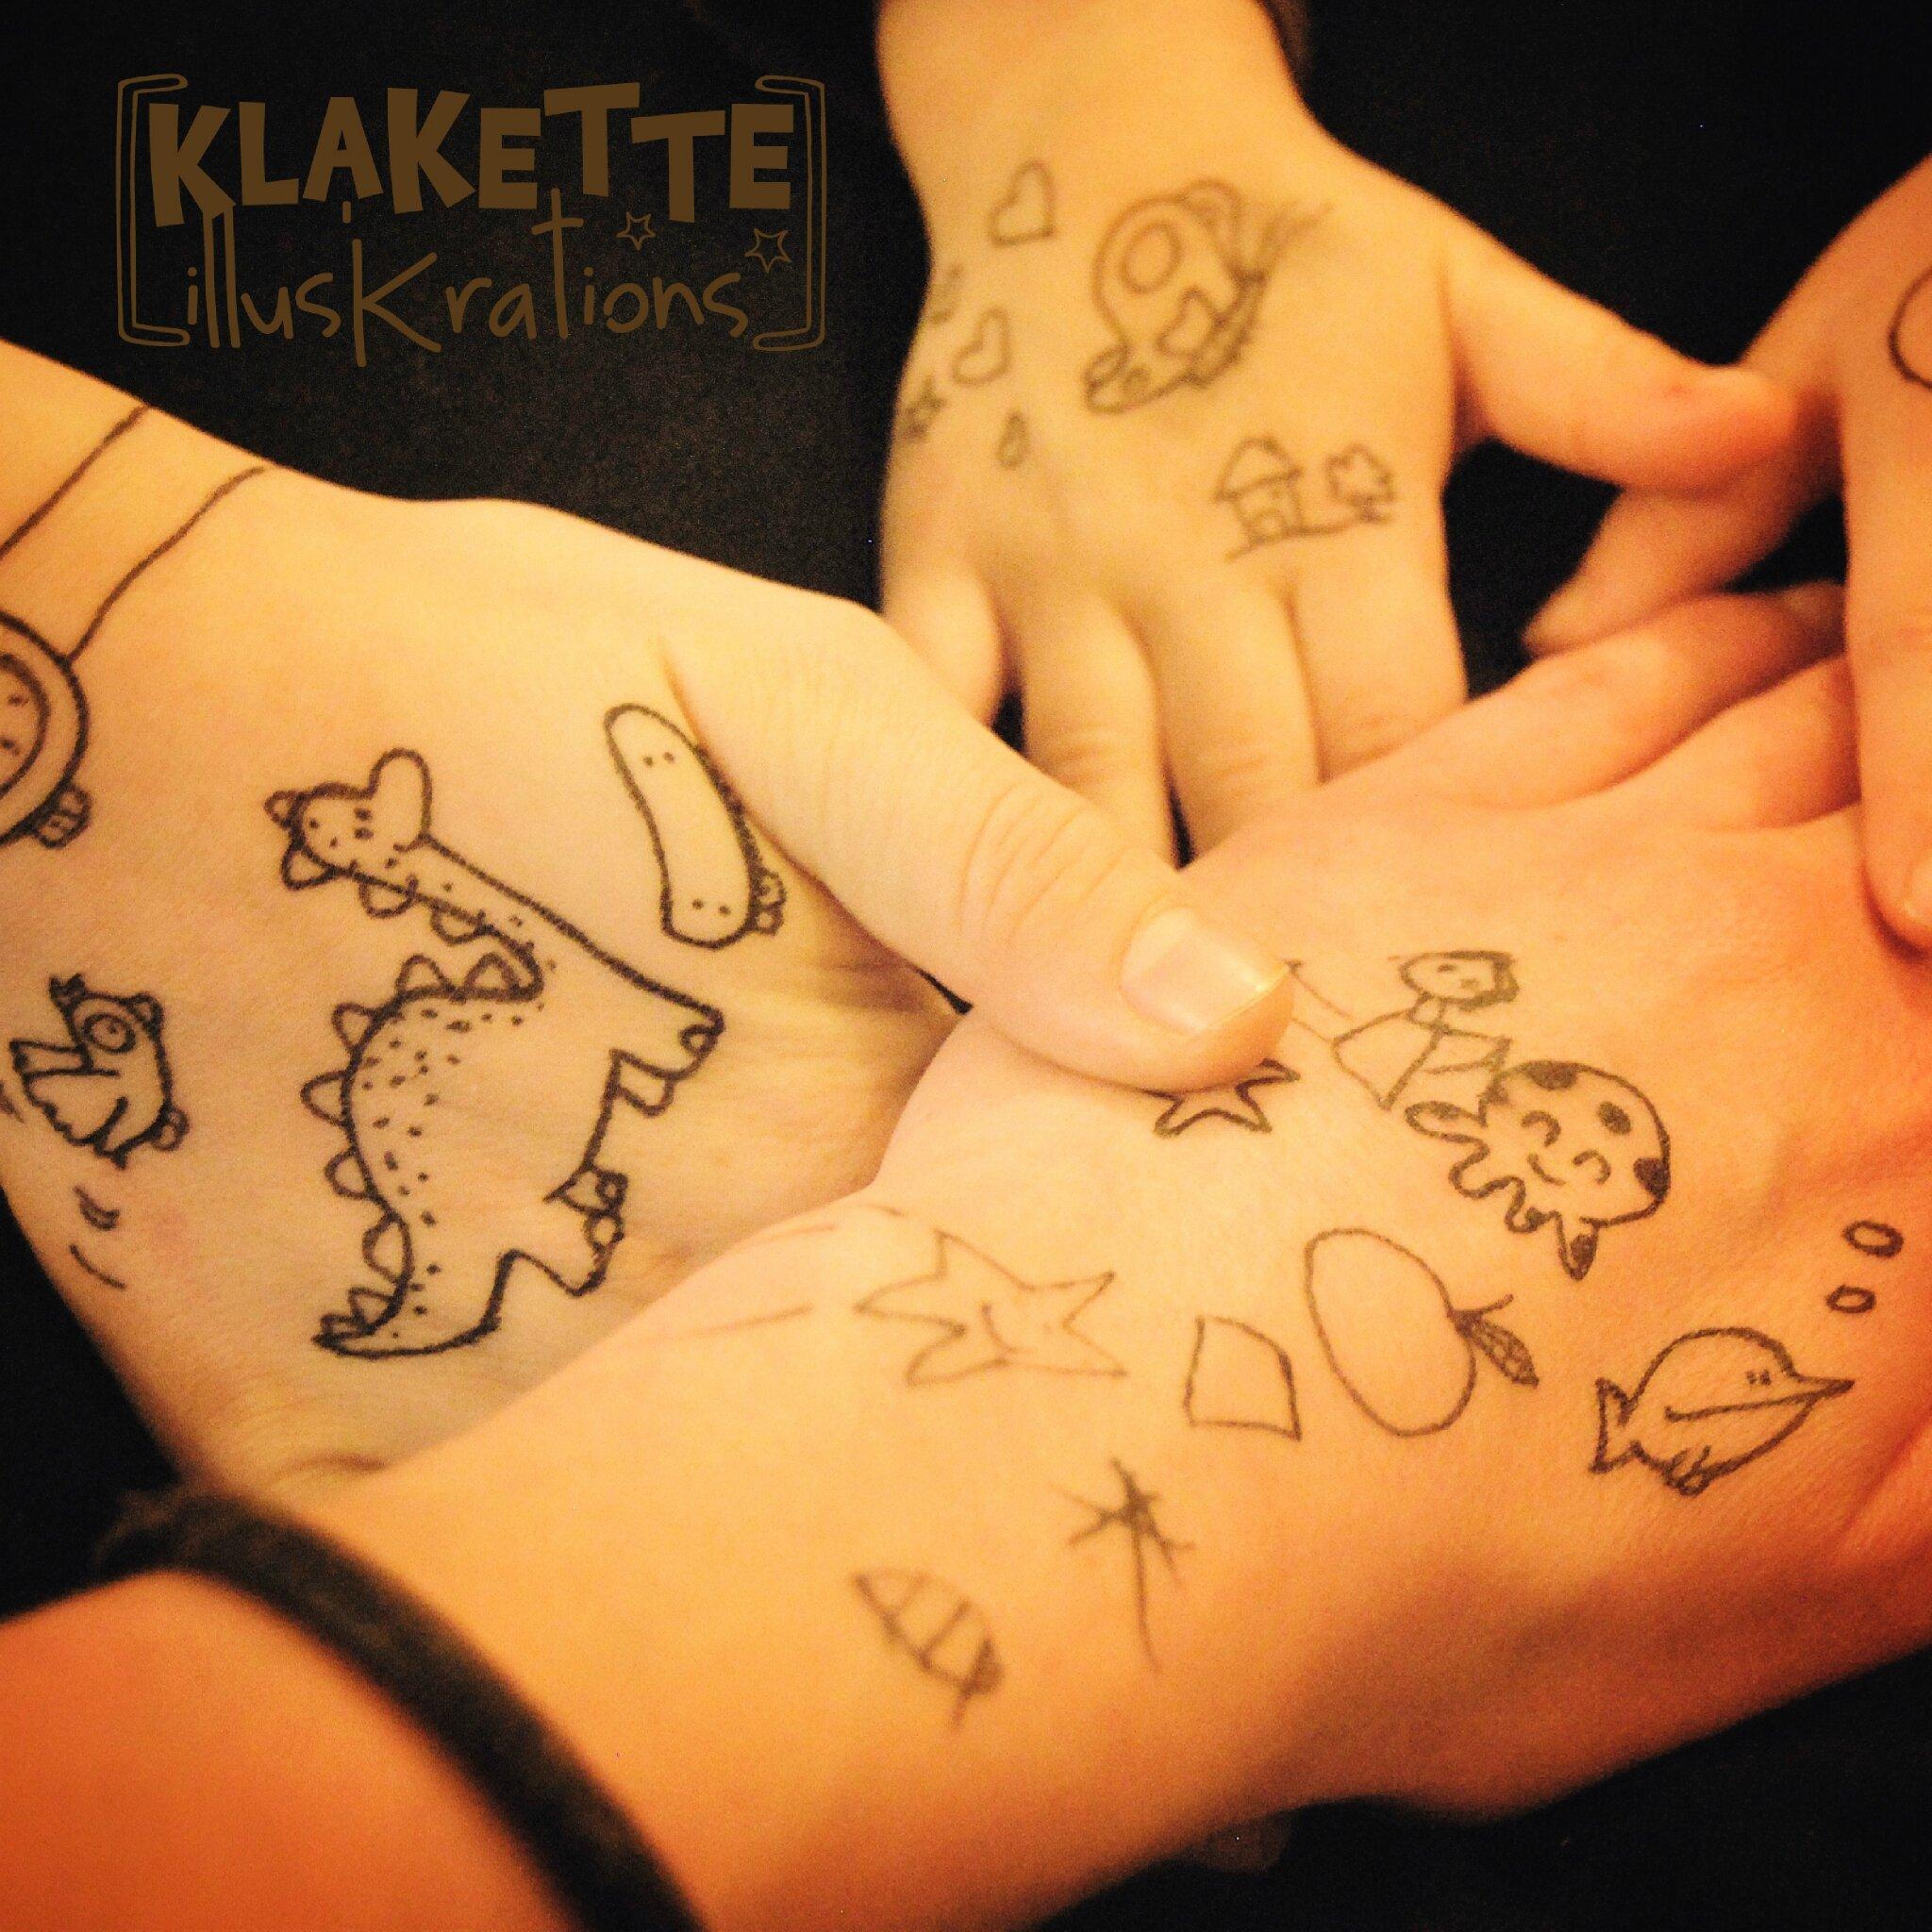 Famille de tatoués